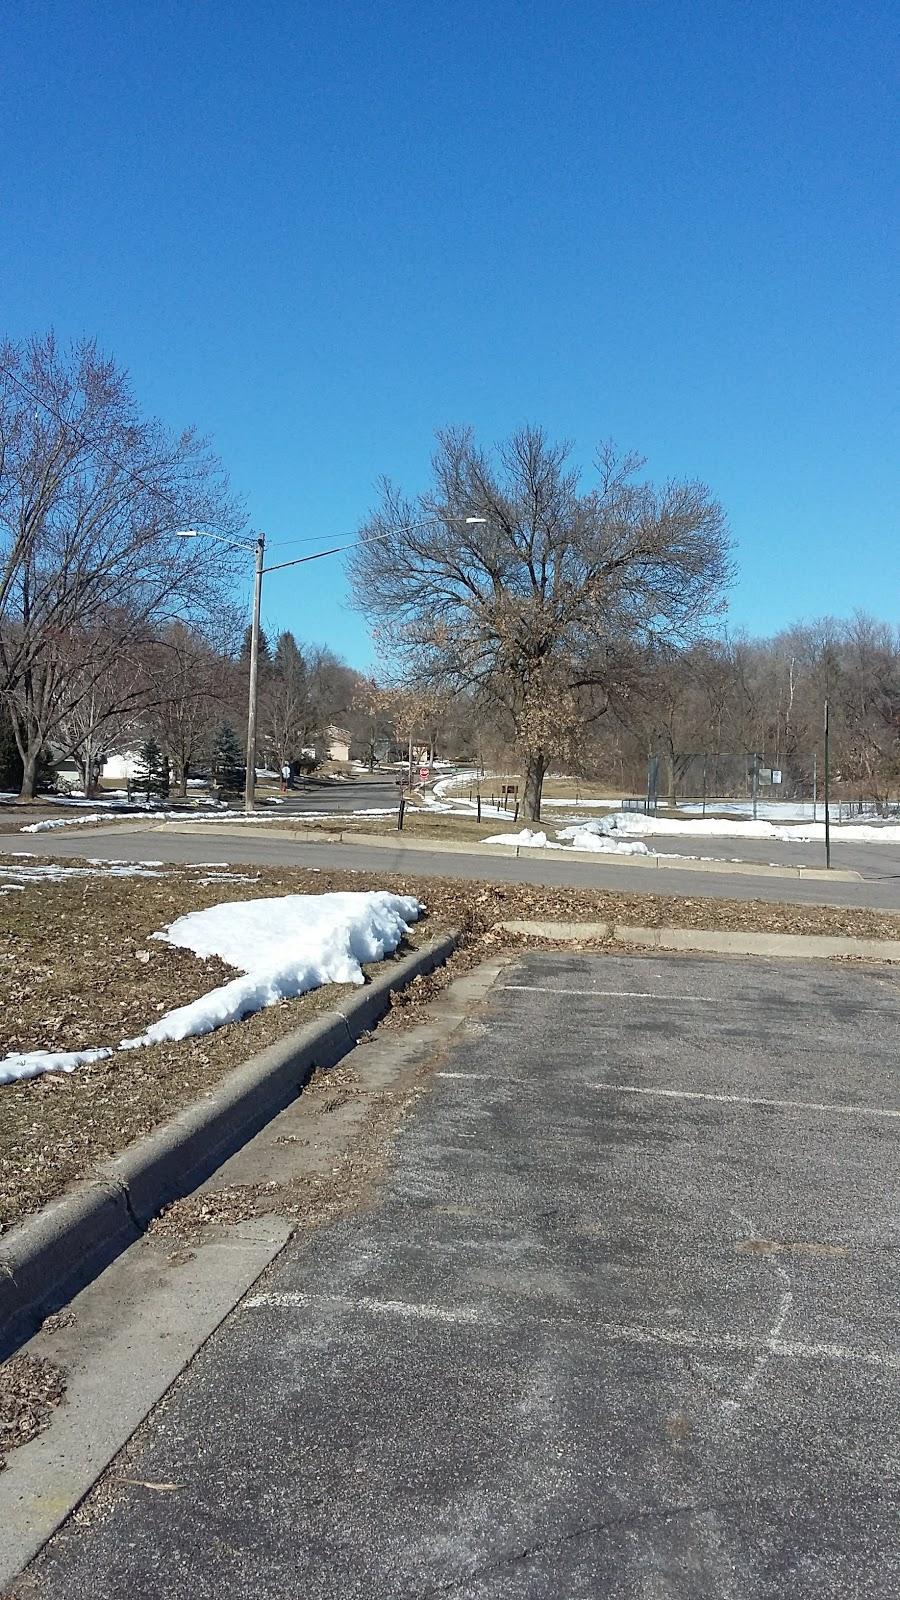 Southglen Park Rink - park  | Photo 4 of 10 | Address: 10701 Rich Ave S, Bloomington, MN 55437, USA | Phone: (952) 563-8878